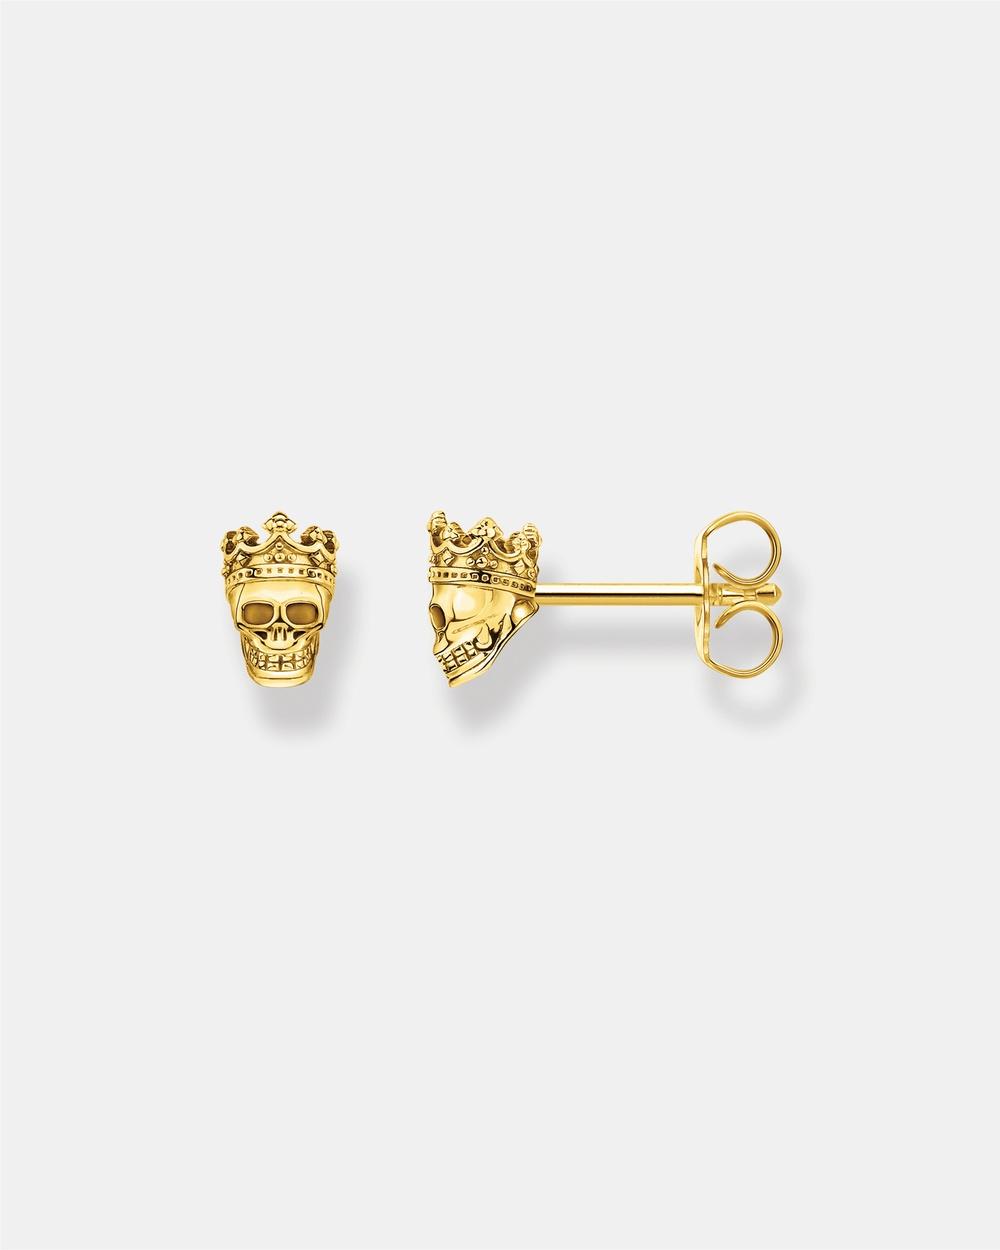 THOMAS SABO Ear Studs Skull Jewellery Gold